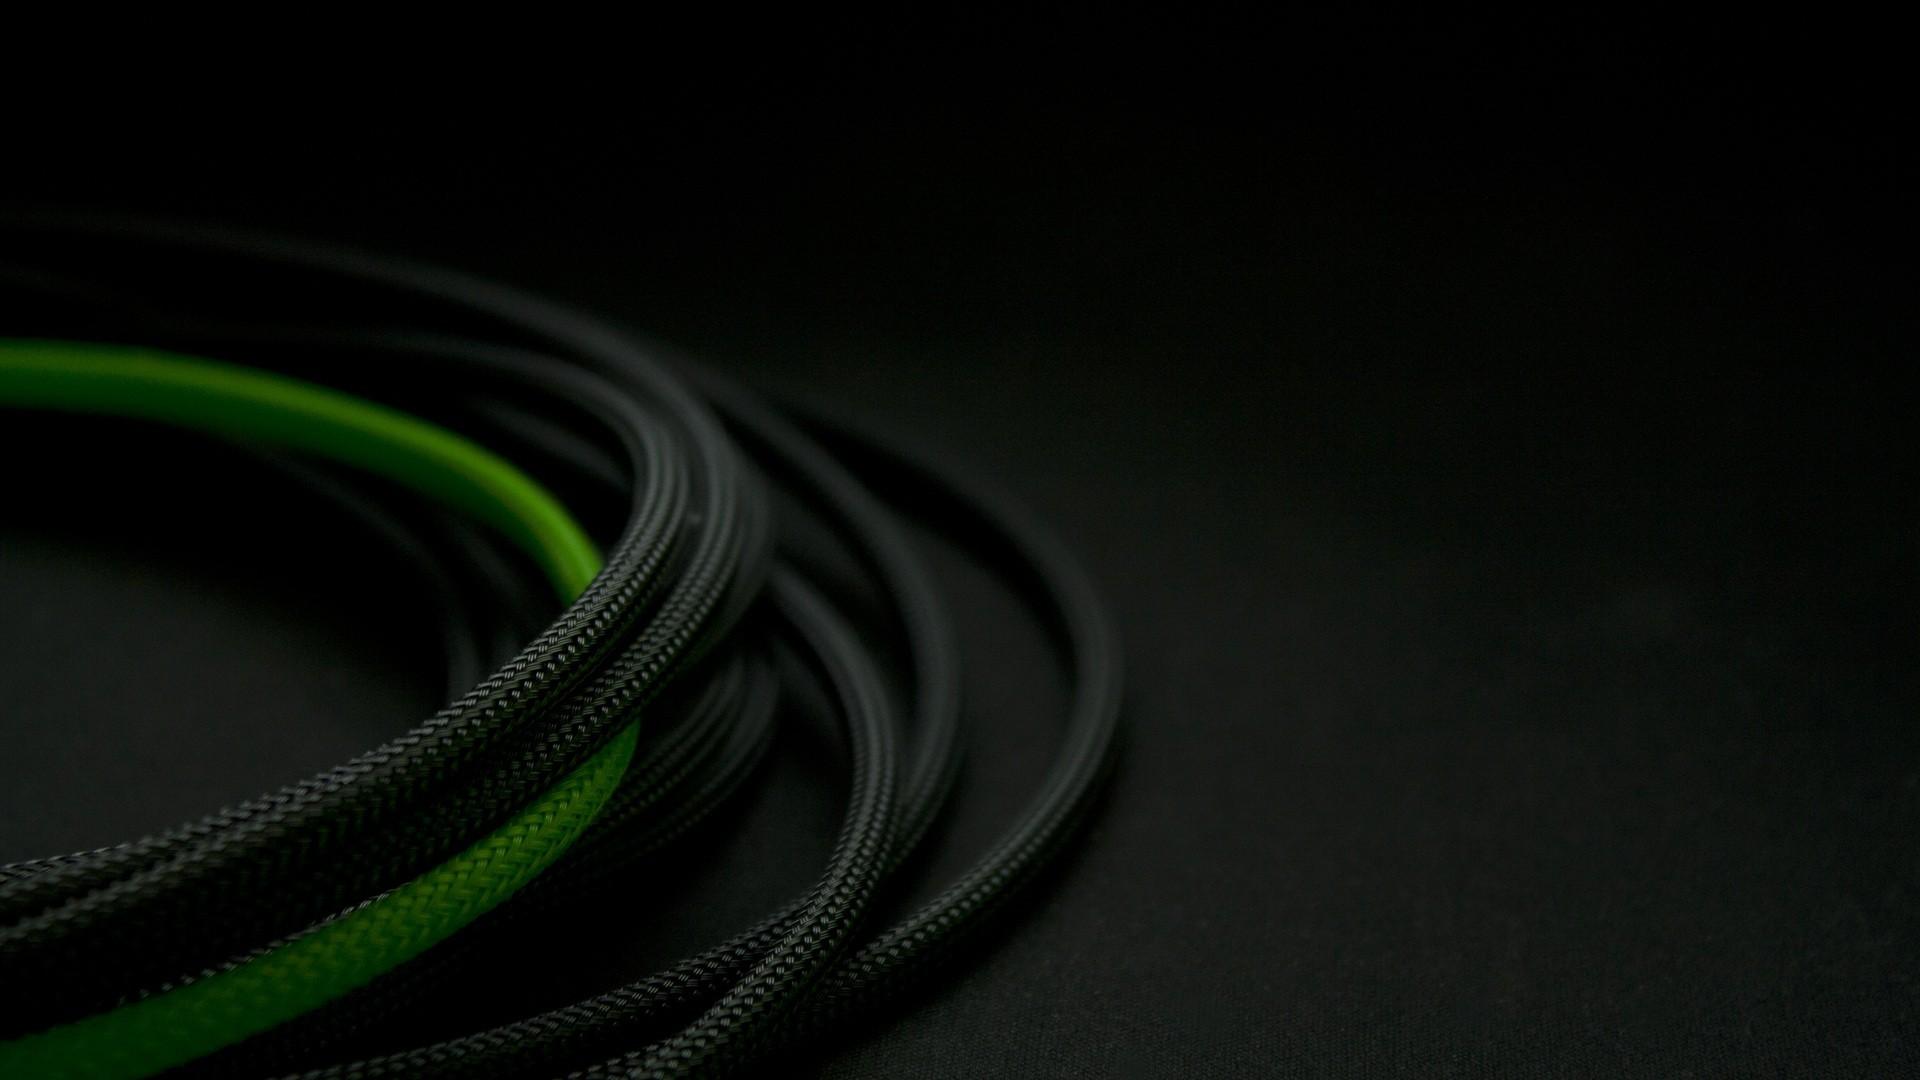 48 Green And Black Wallpapers On Wallpapersafari